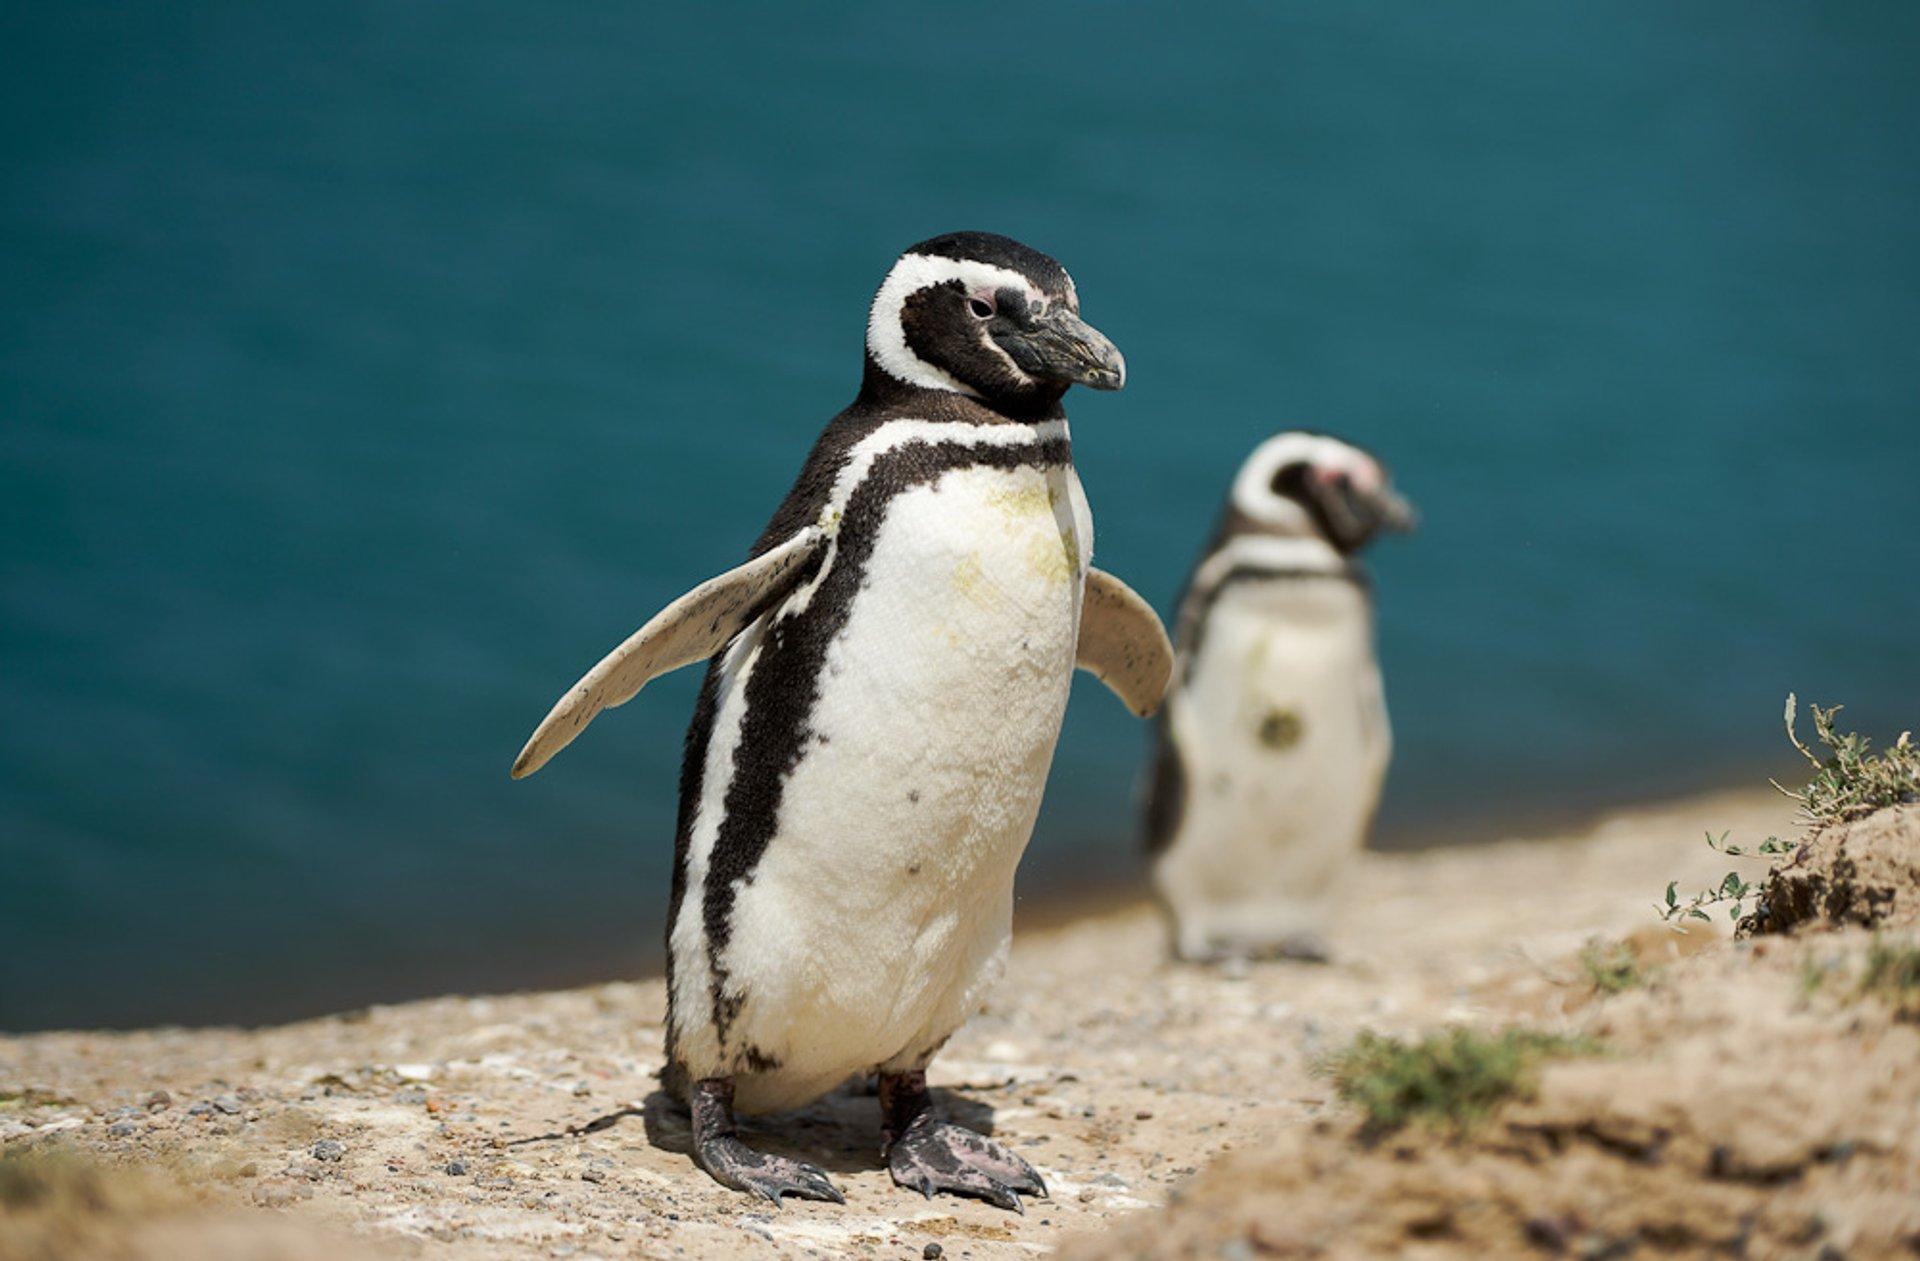 Magellenic penguin, Punta Tombo 2020